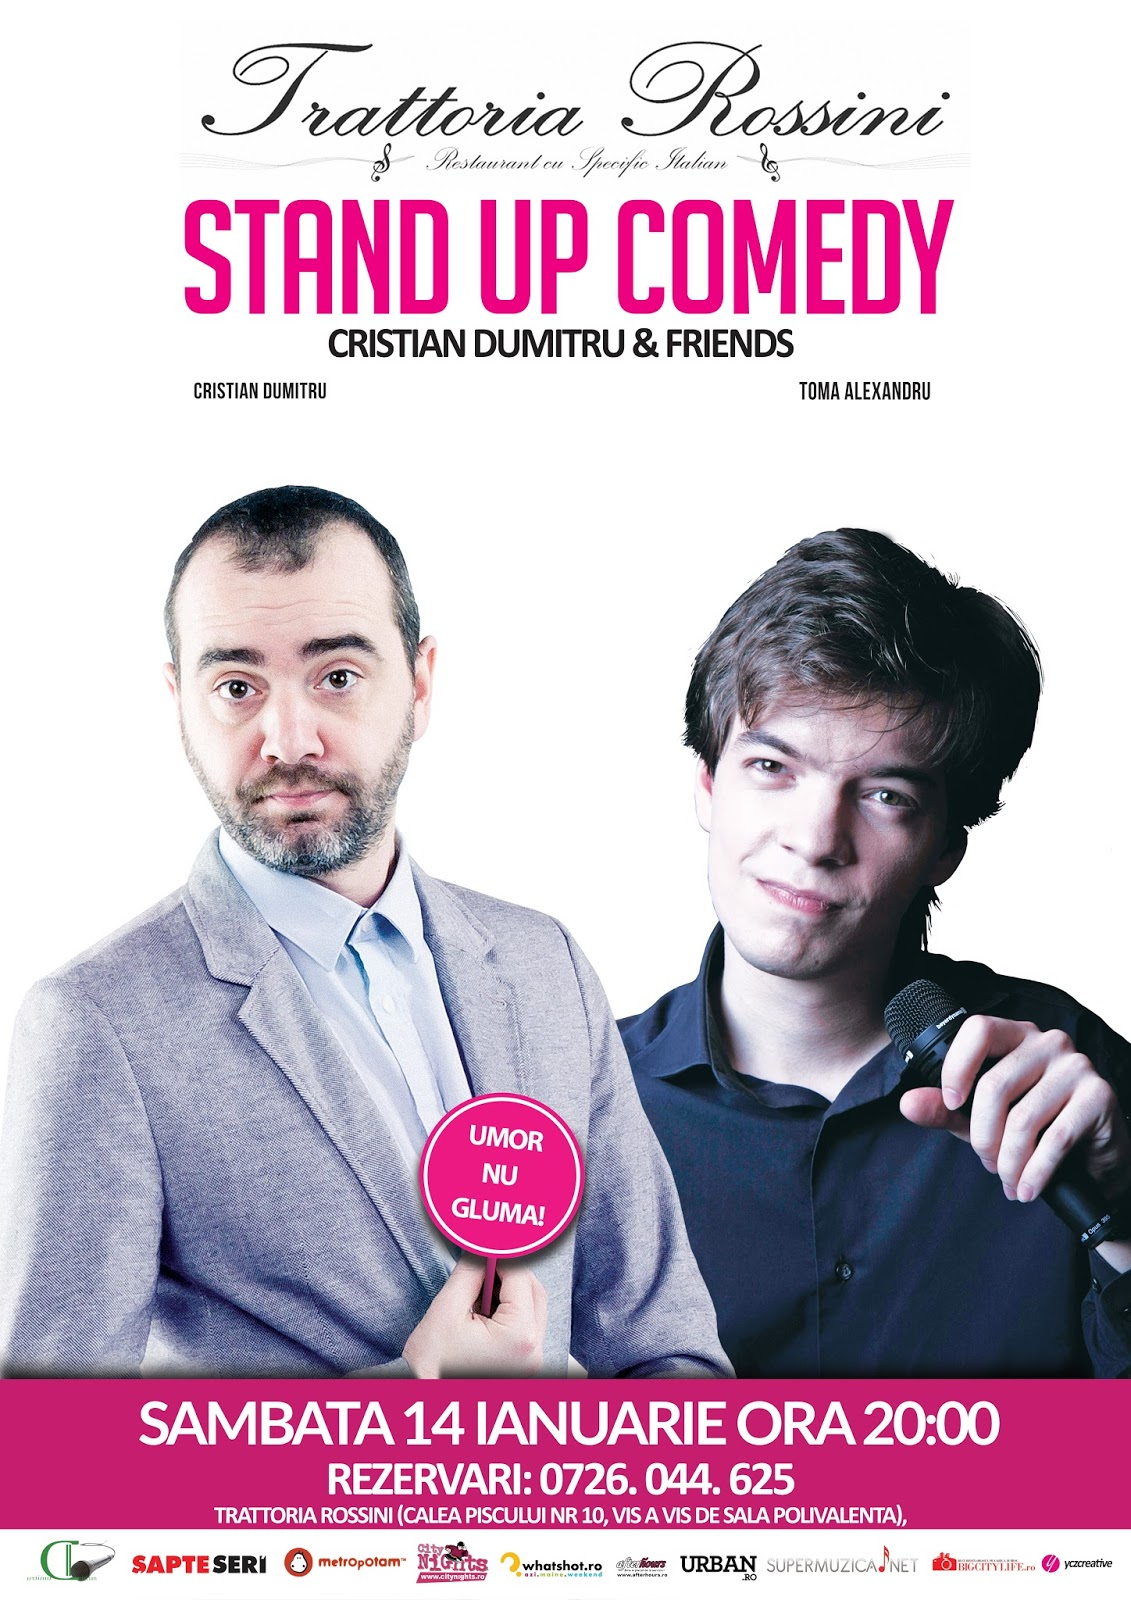 Stand-Up Comedy Sambata 14 Ianuarie Bucuresti @ Rossini